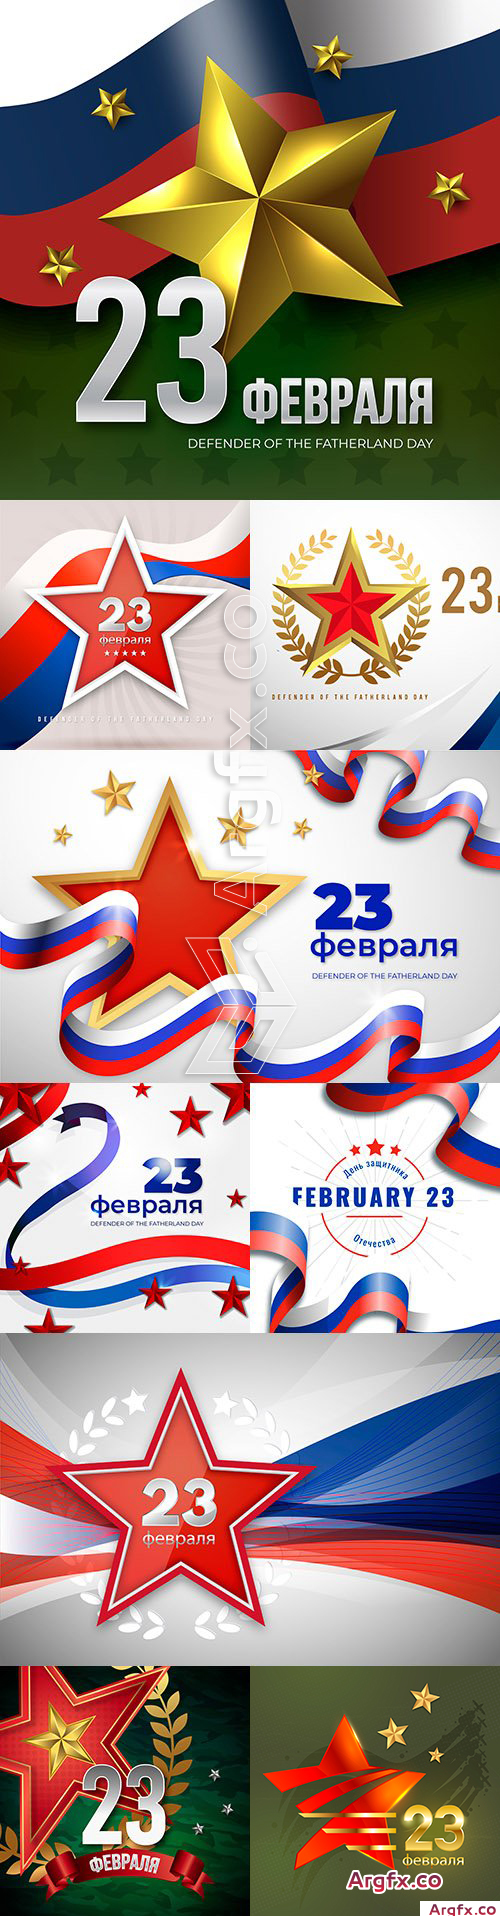 February 23 Defender Fatherland Day illustration